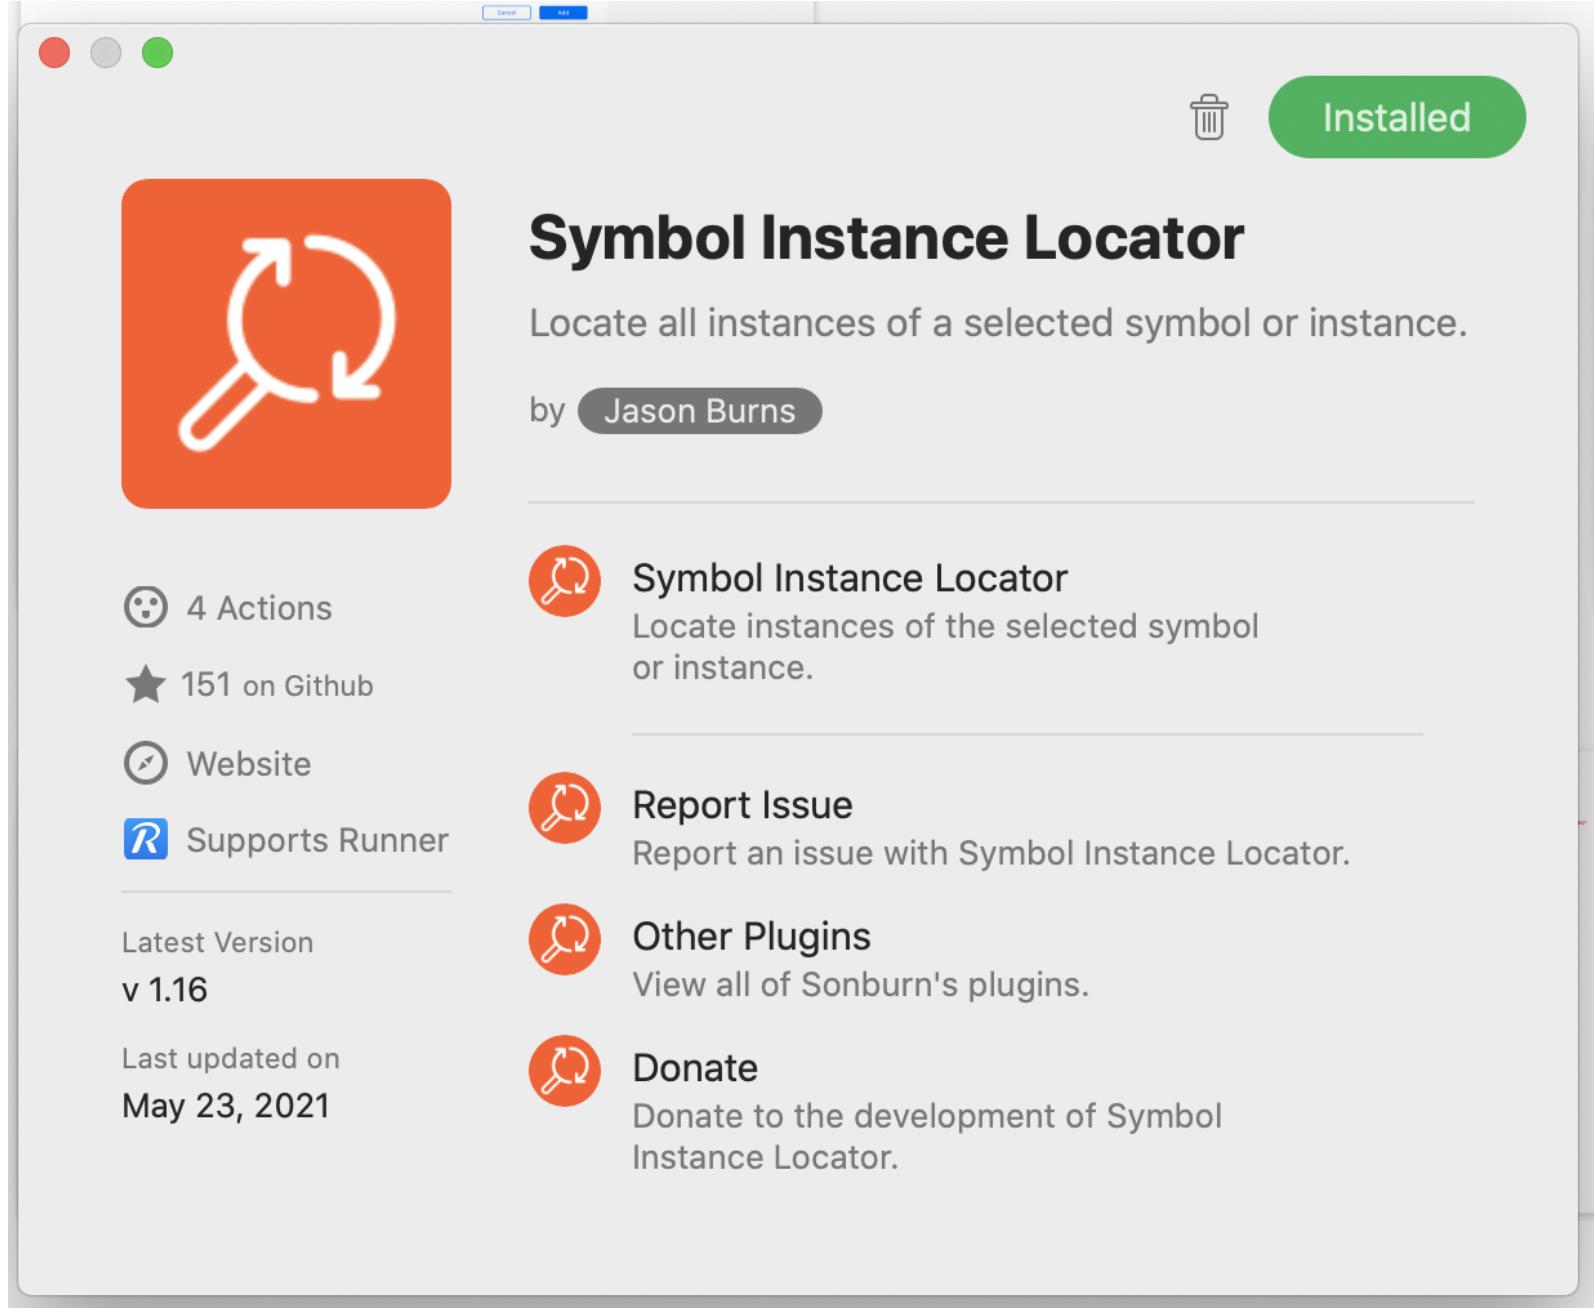 Symbol Instance Locator installed confirmation dialog